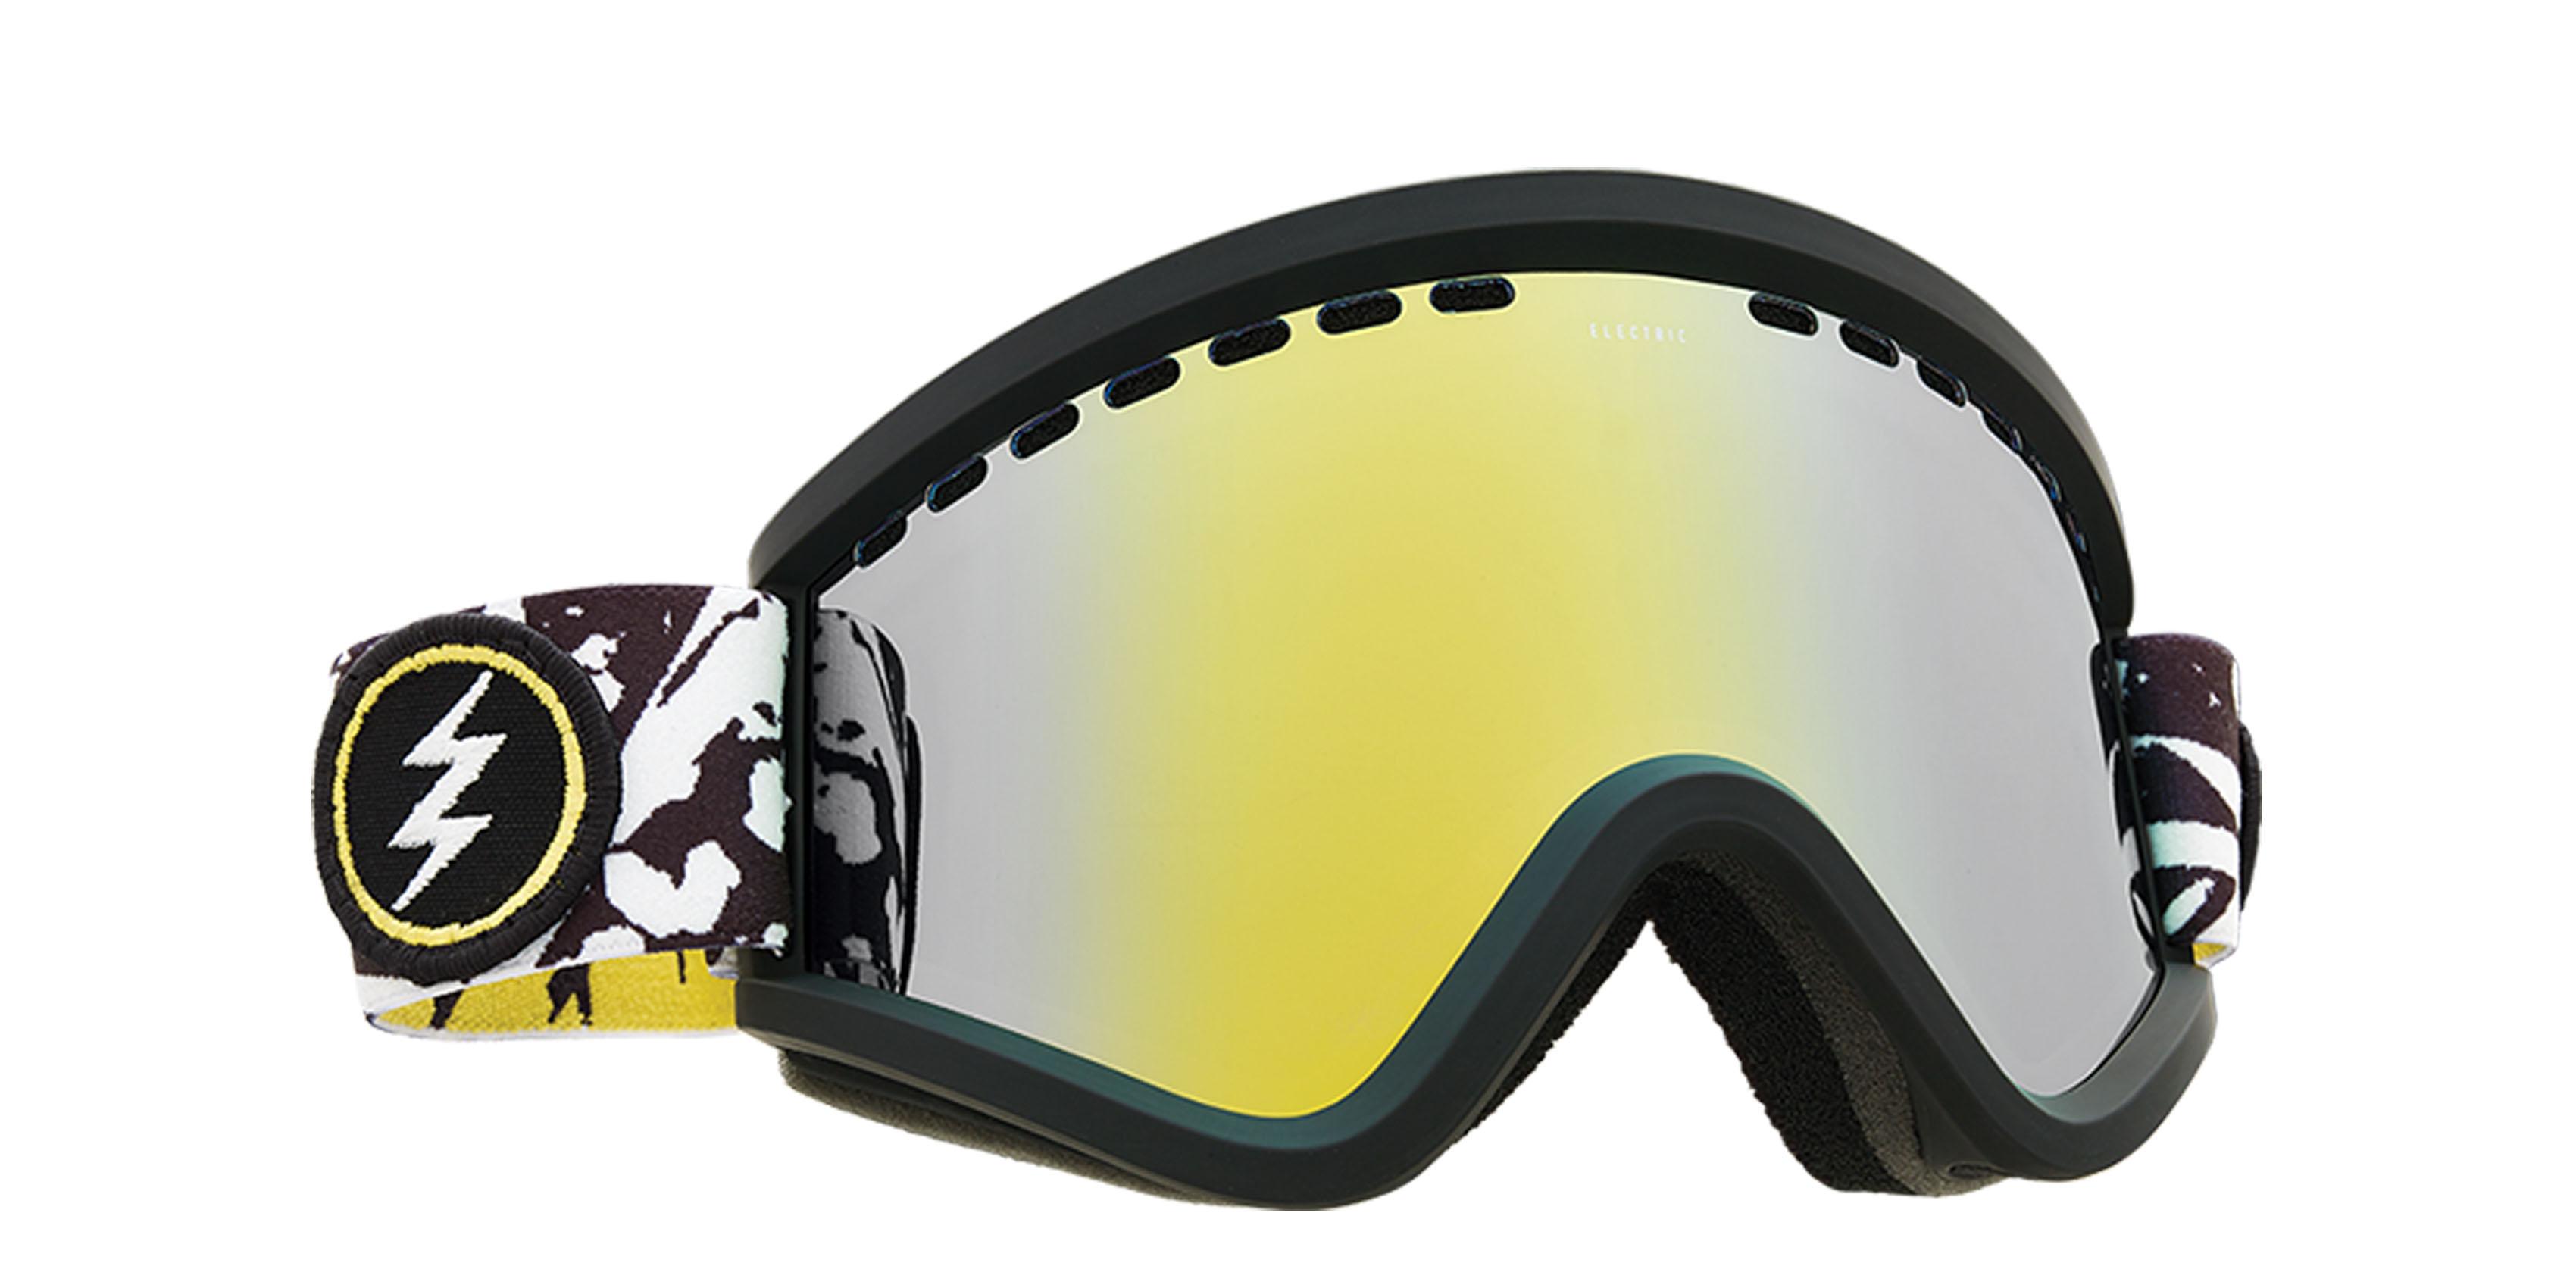 affb7c01979 Electric EGV Snowboard Goggles 2018 - Bones w Brose Gold Chrome + Bonus  Choice Lens